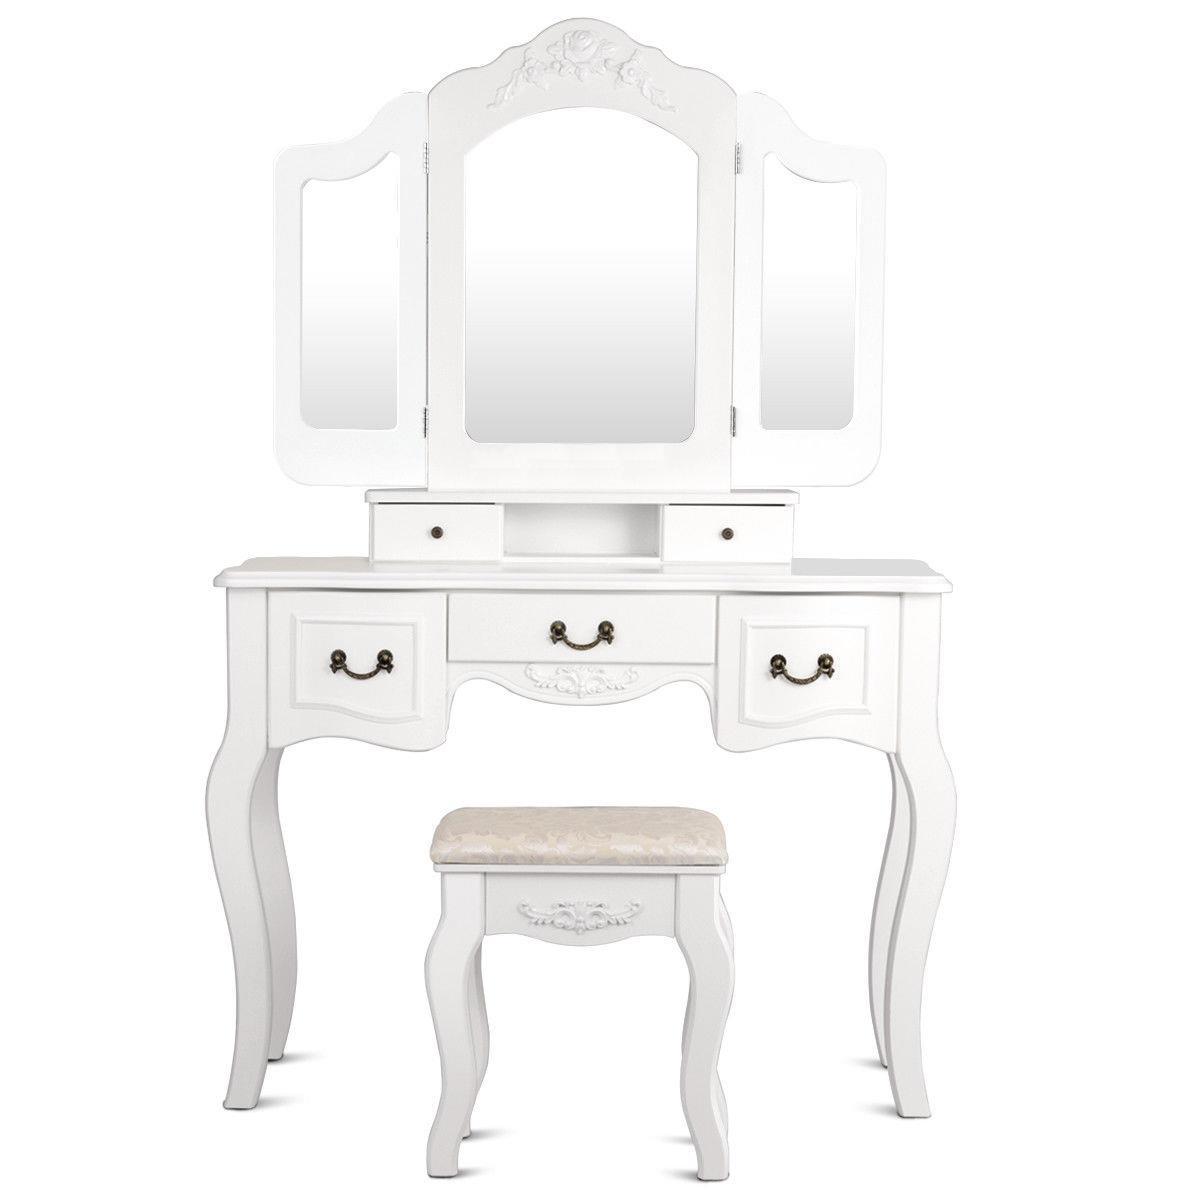 Tri-Folding Mirror Vanity Set 5 Drawers Dressing Table Makeup Desk/&Stool 2 Color